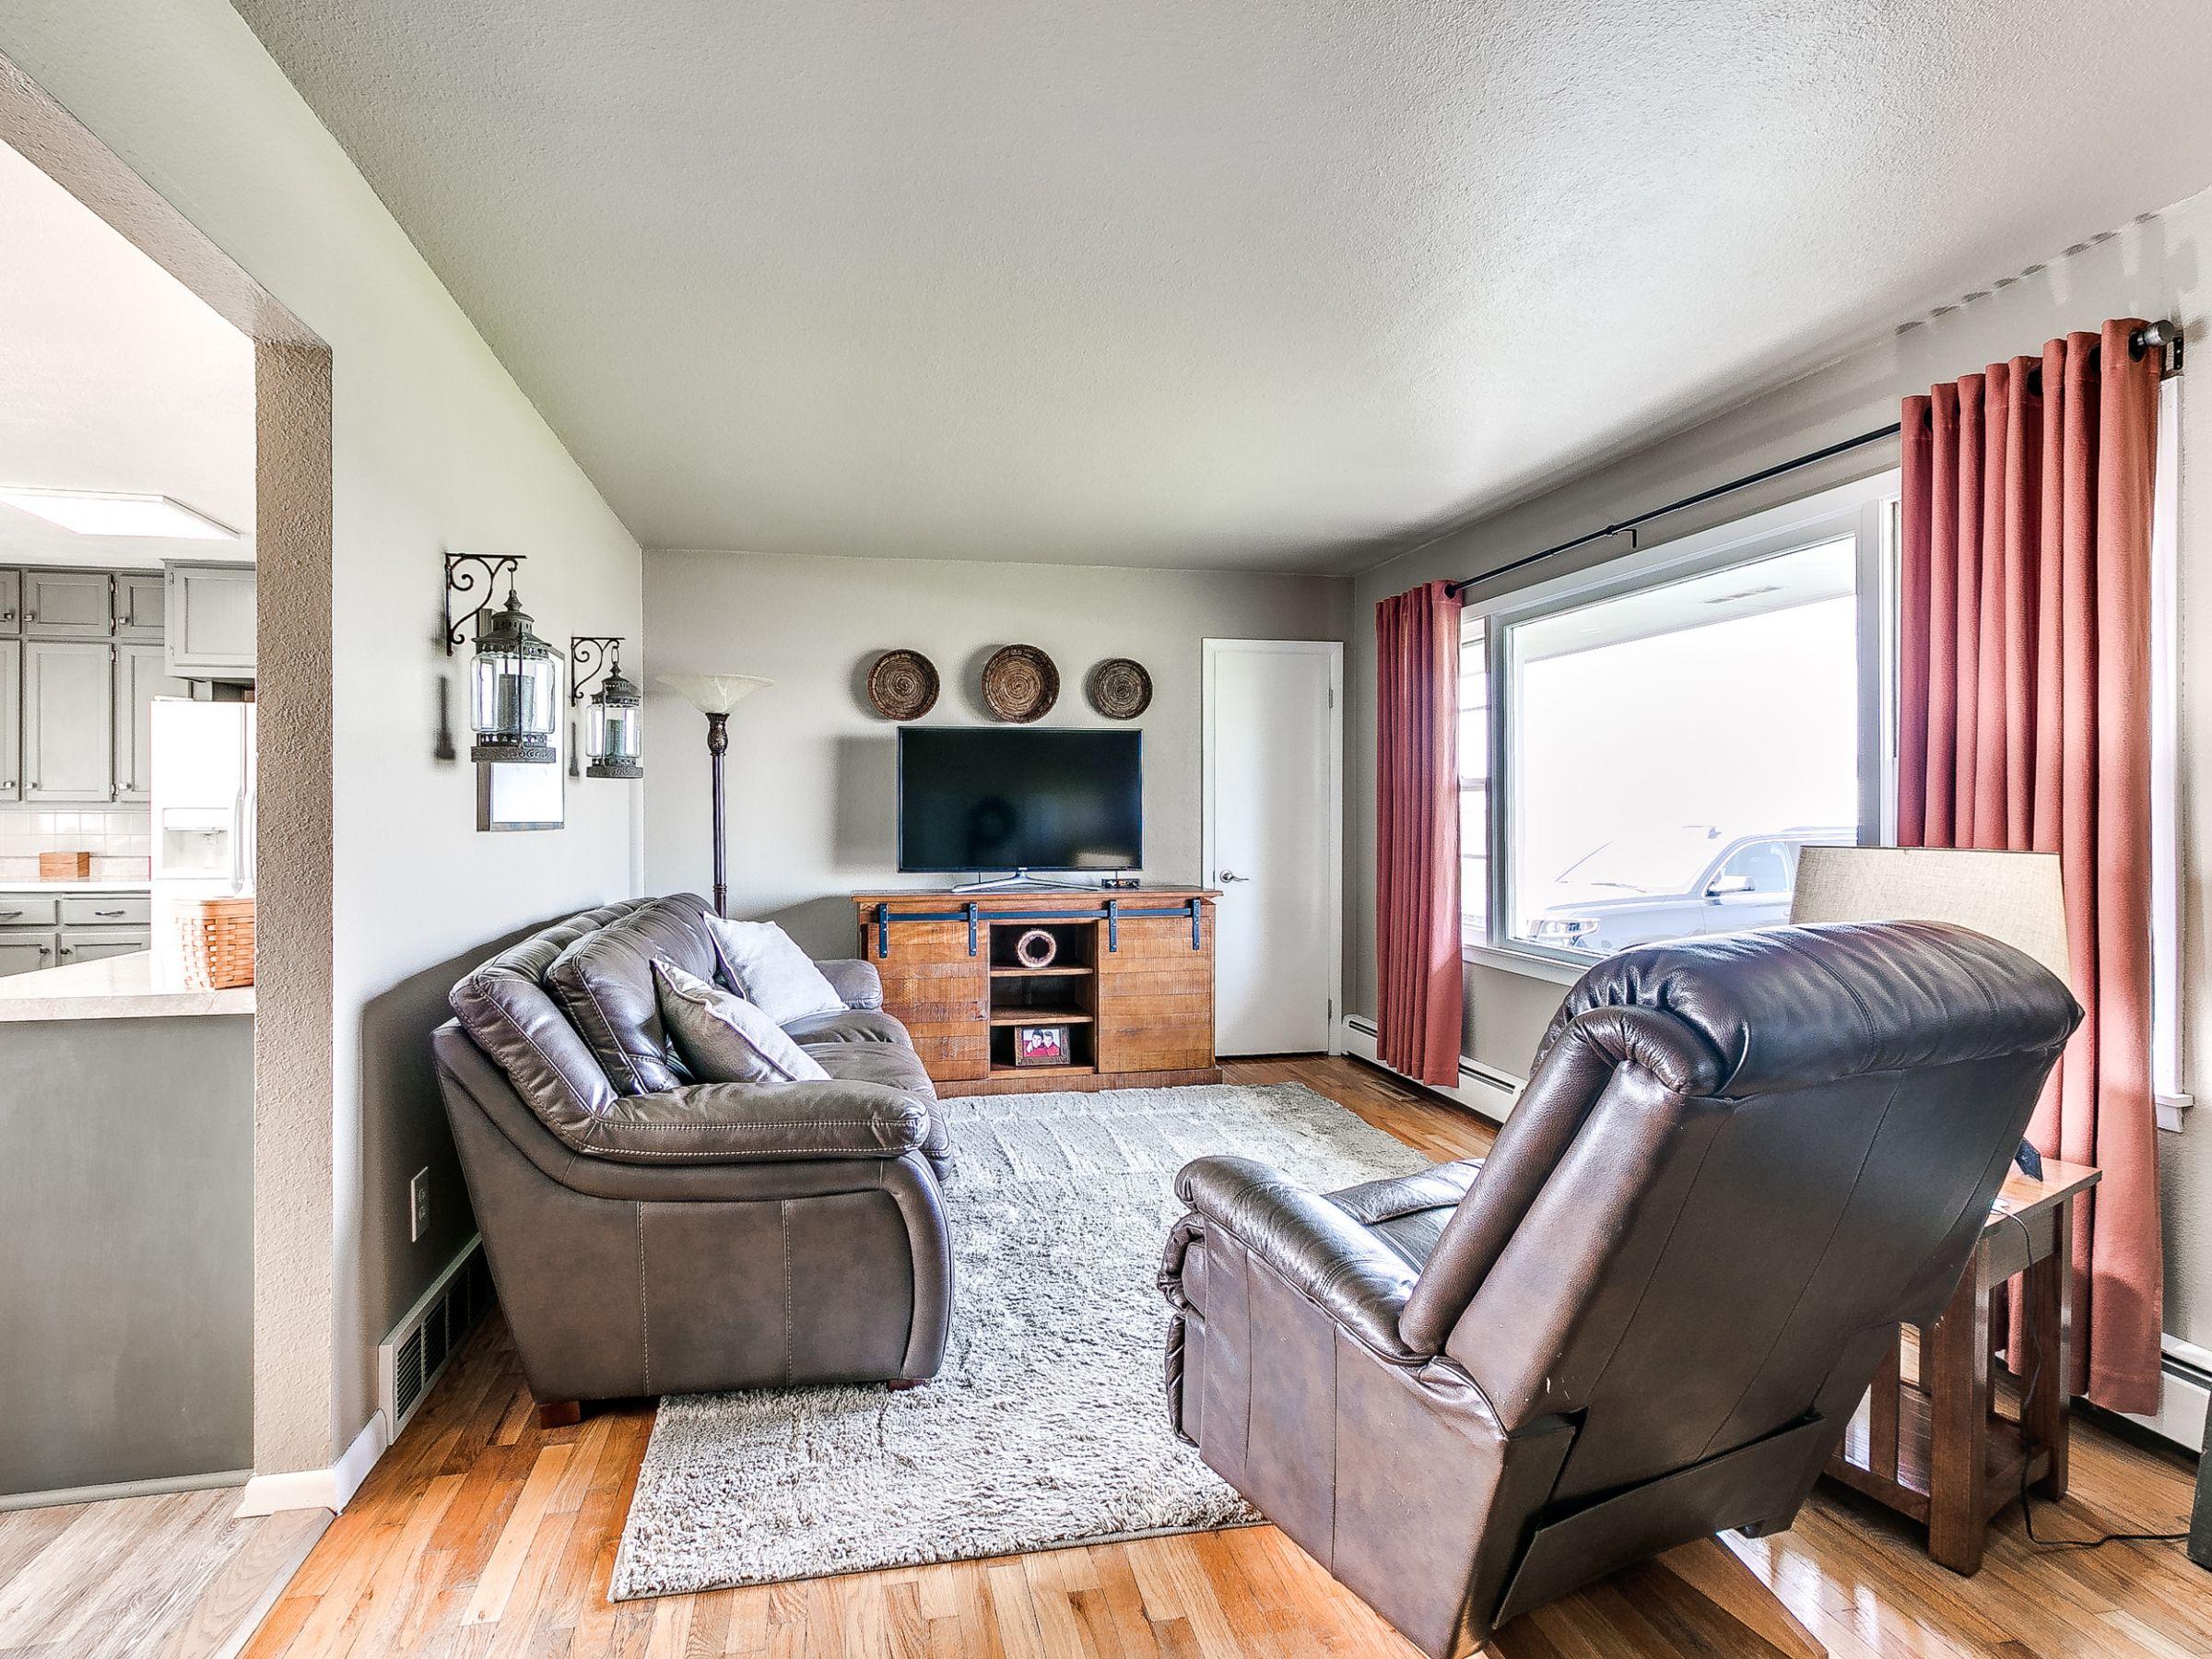 residential-warren-county-iowa-3-acres-listing-number-15516-1-2021-05-12-144929.jpg